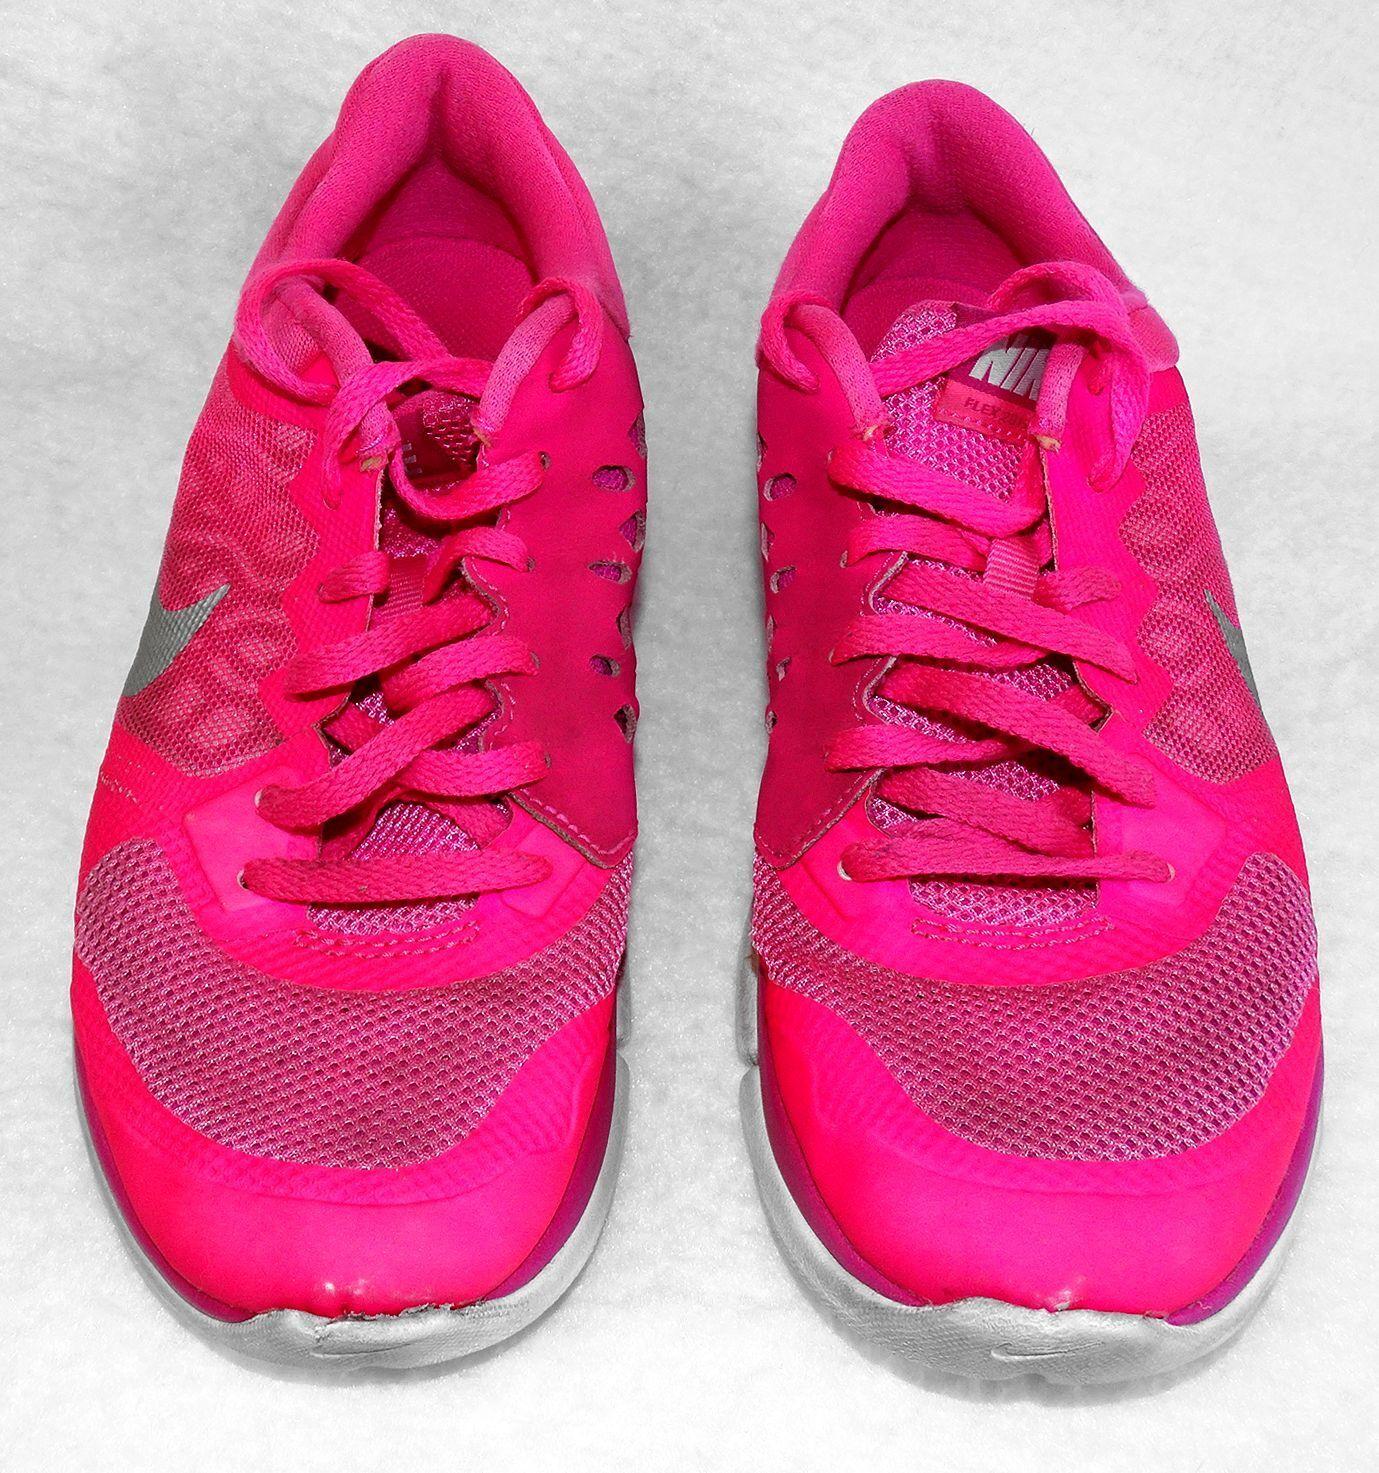 Sz 7 femmes NIKE FLEX RUN Athletic Chaussures 709021-600 Hot rose